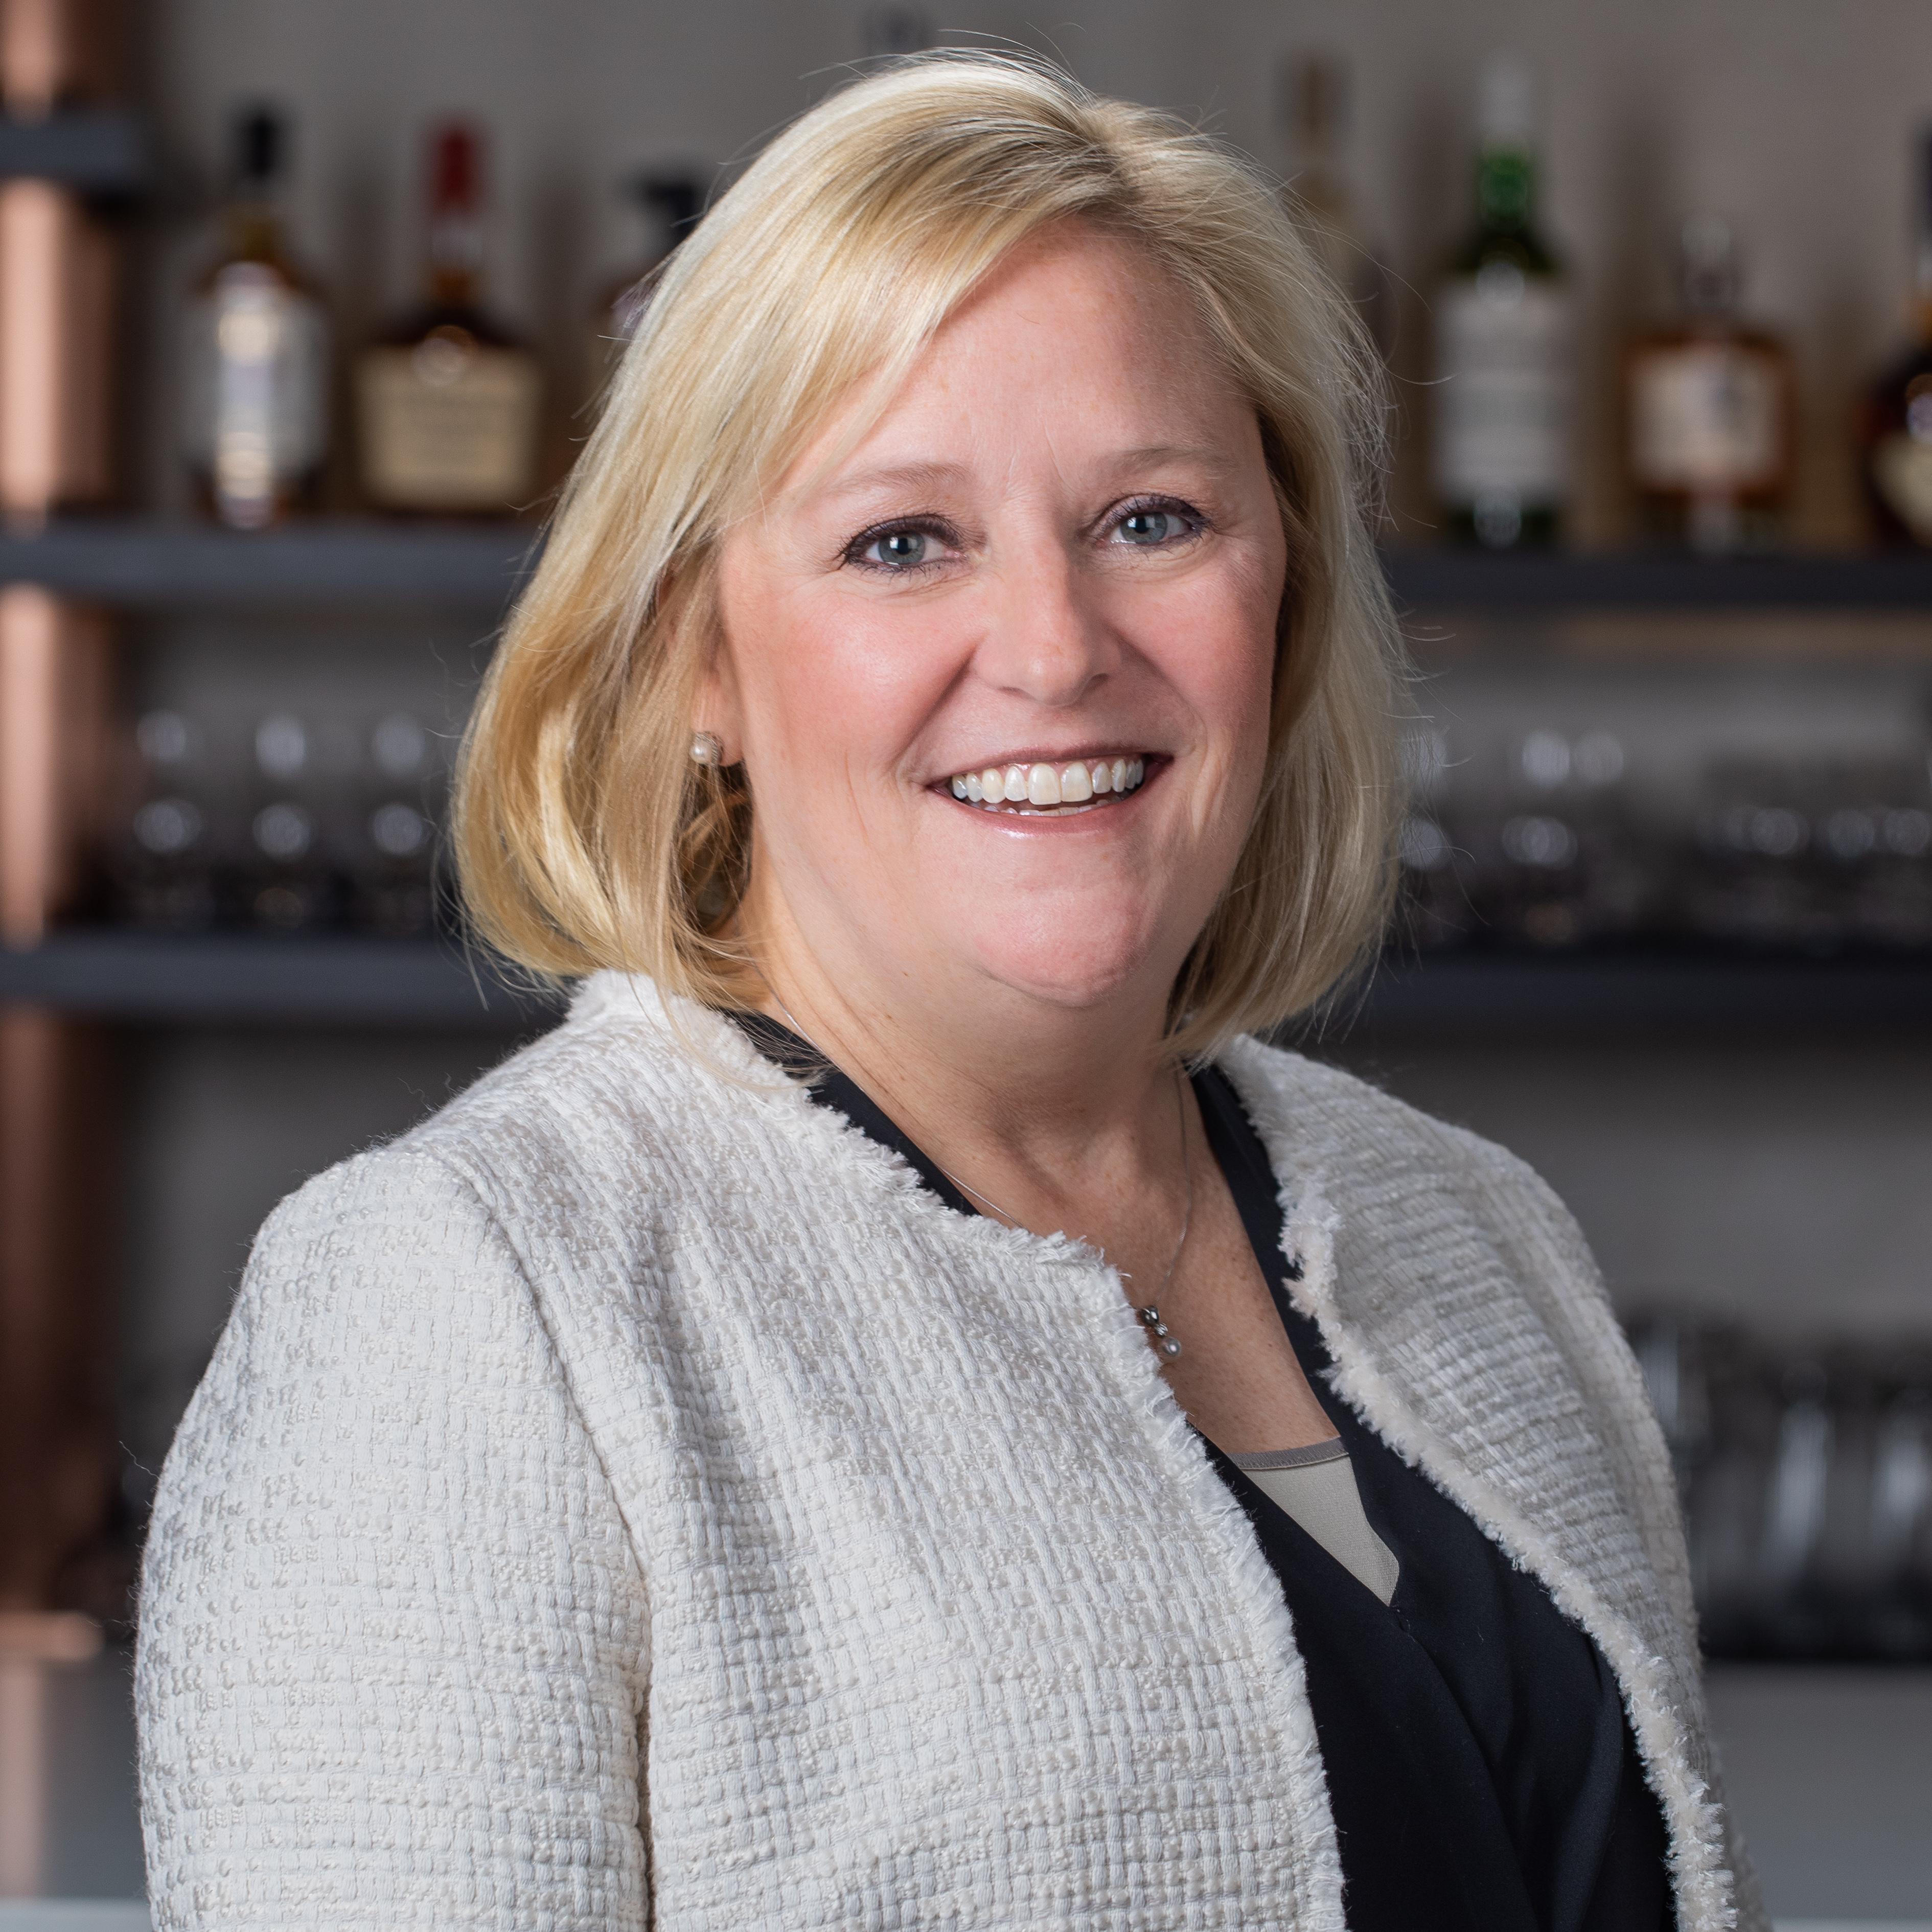 Paula Erickson  - Senior Vice President, Global Chief Human Resource Officer, Beam Suntory Inc.